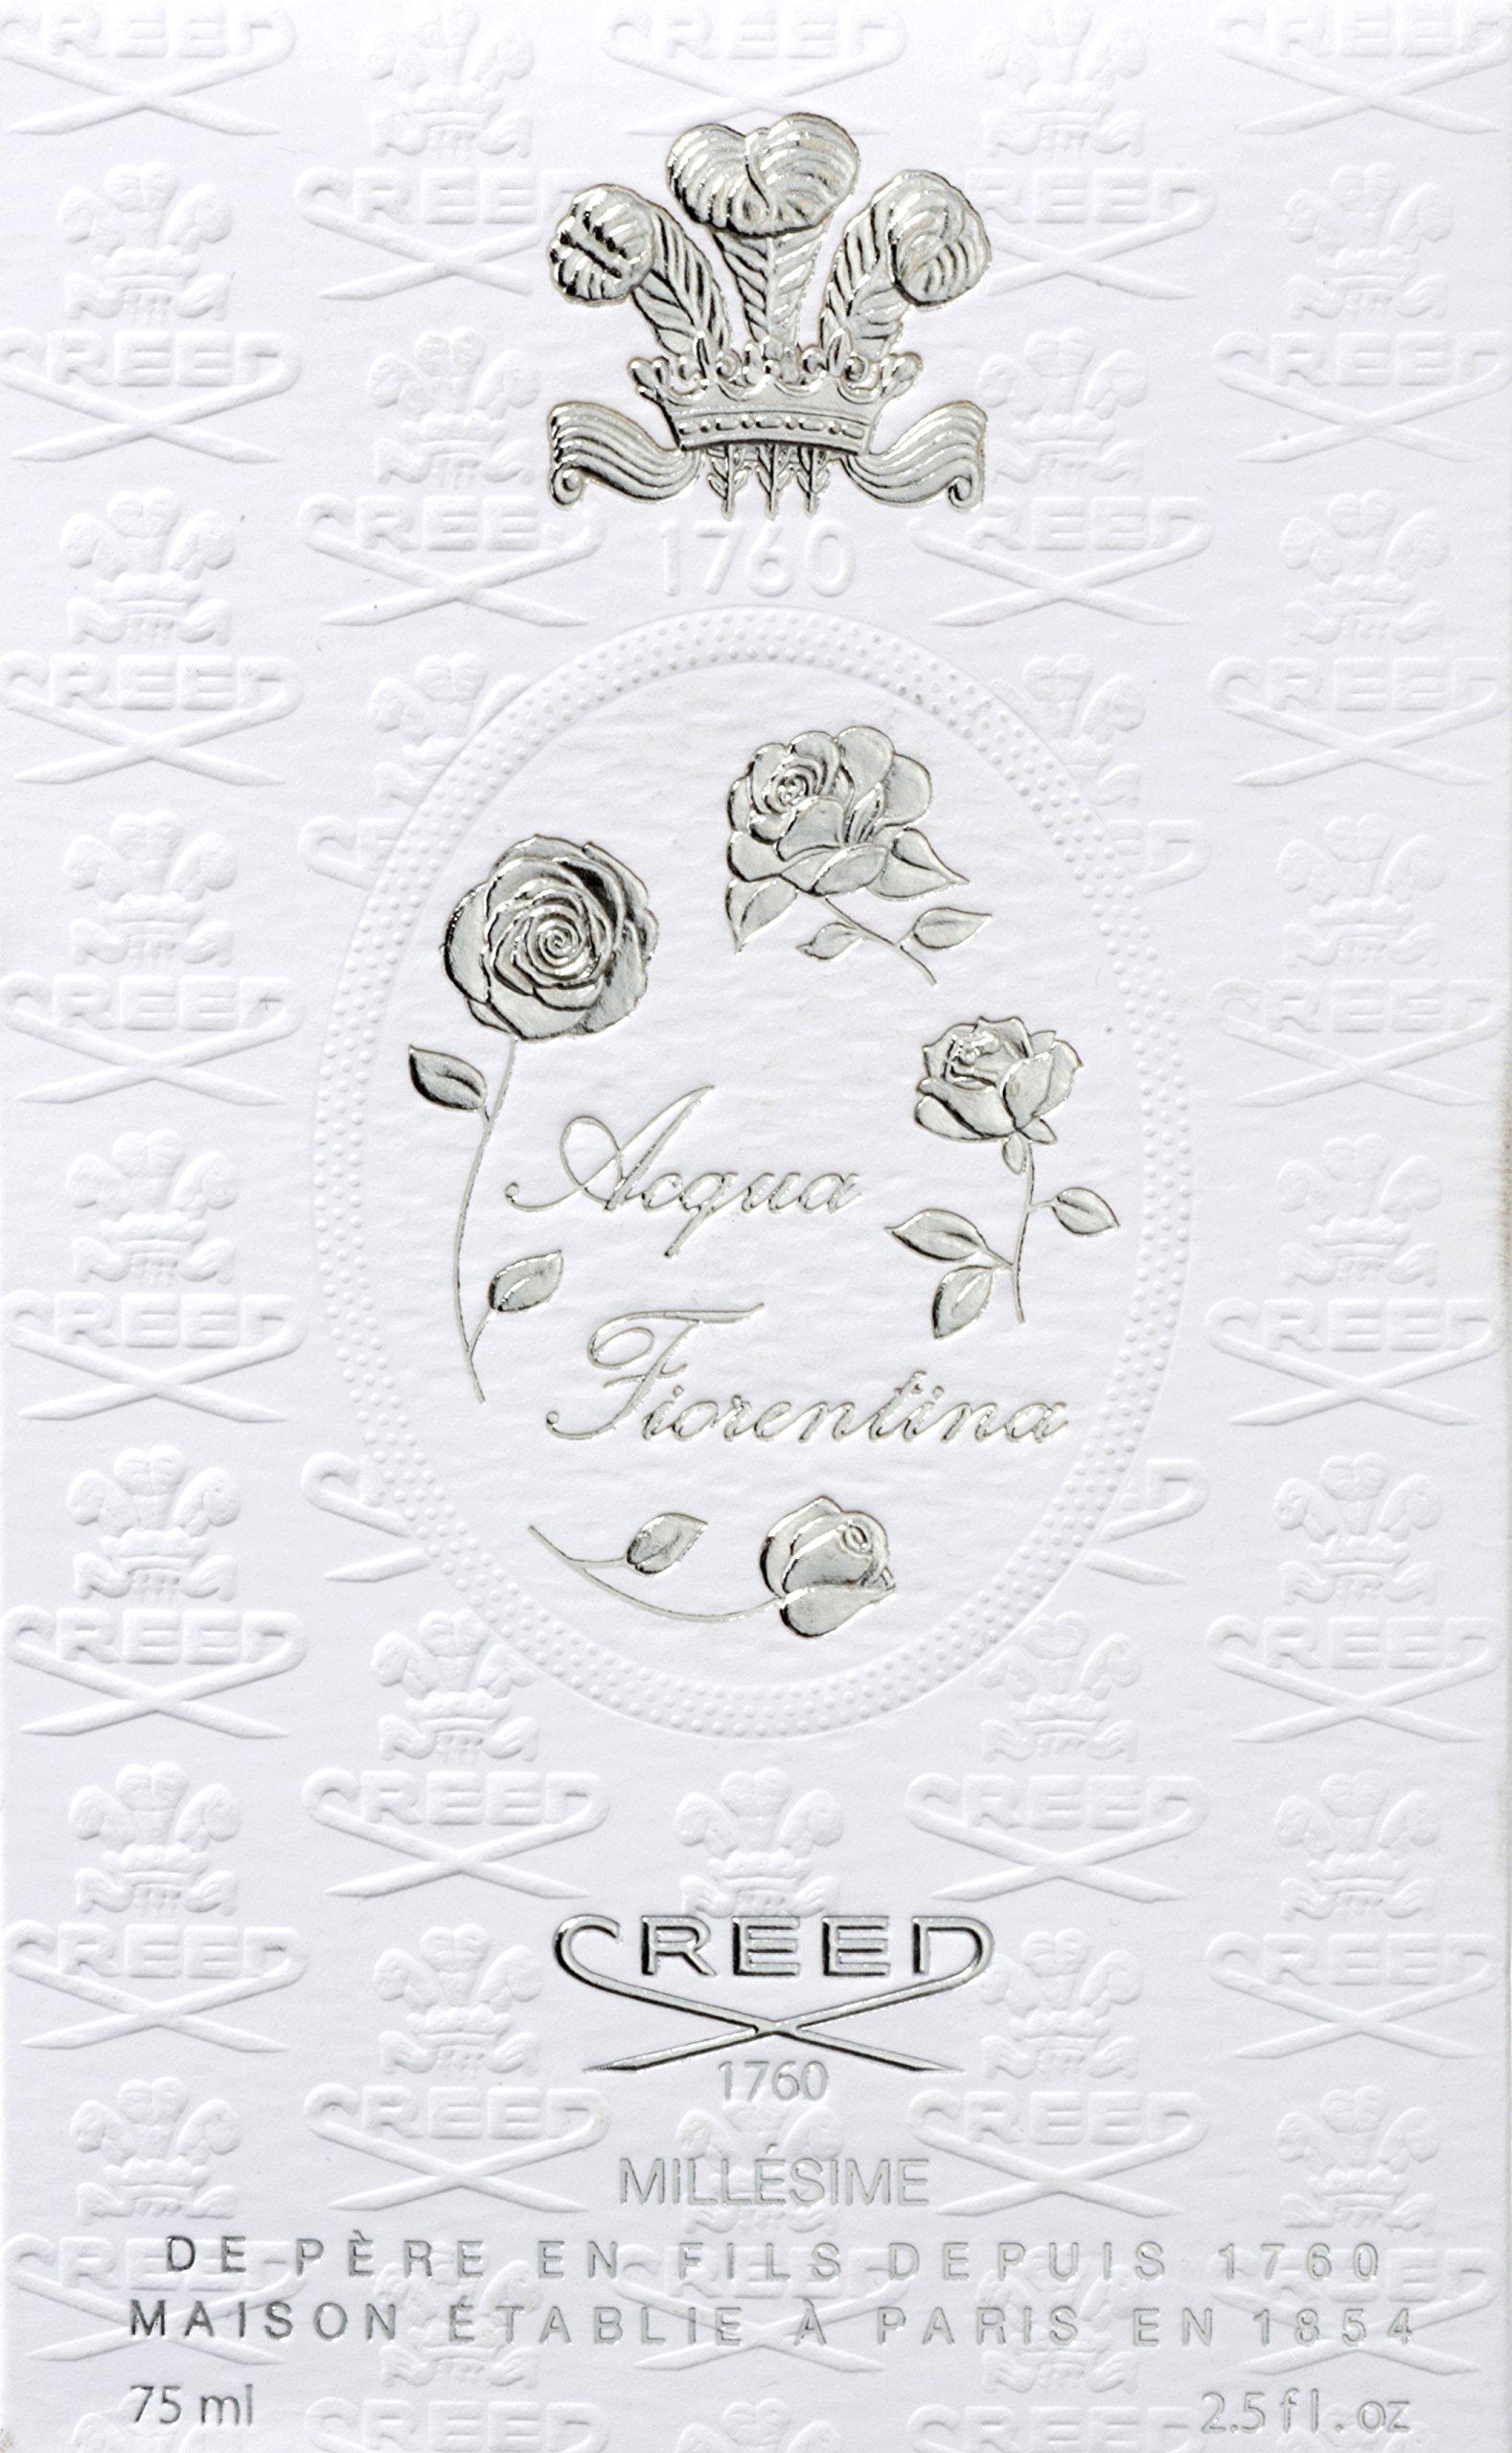 Acqua Fiorentina Perfume by Creed for women Millesime Spray 2.5 oz